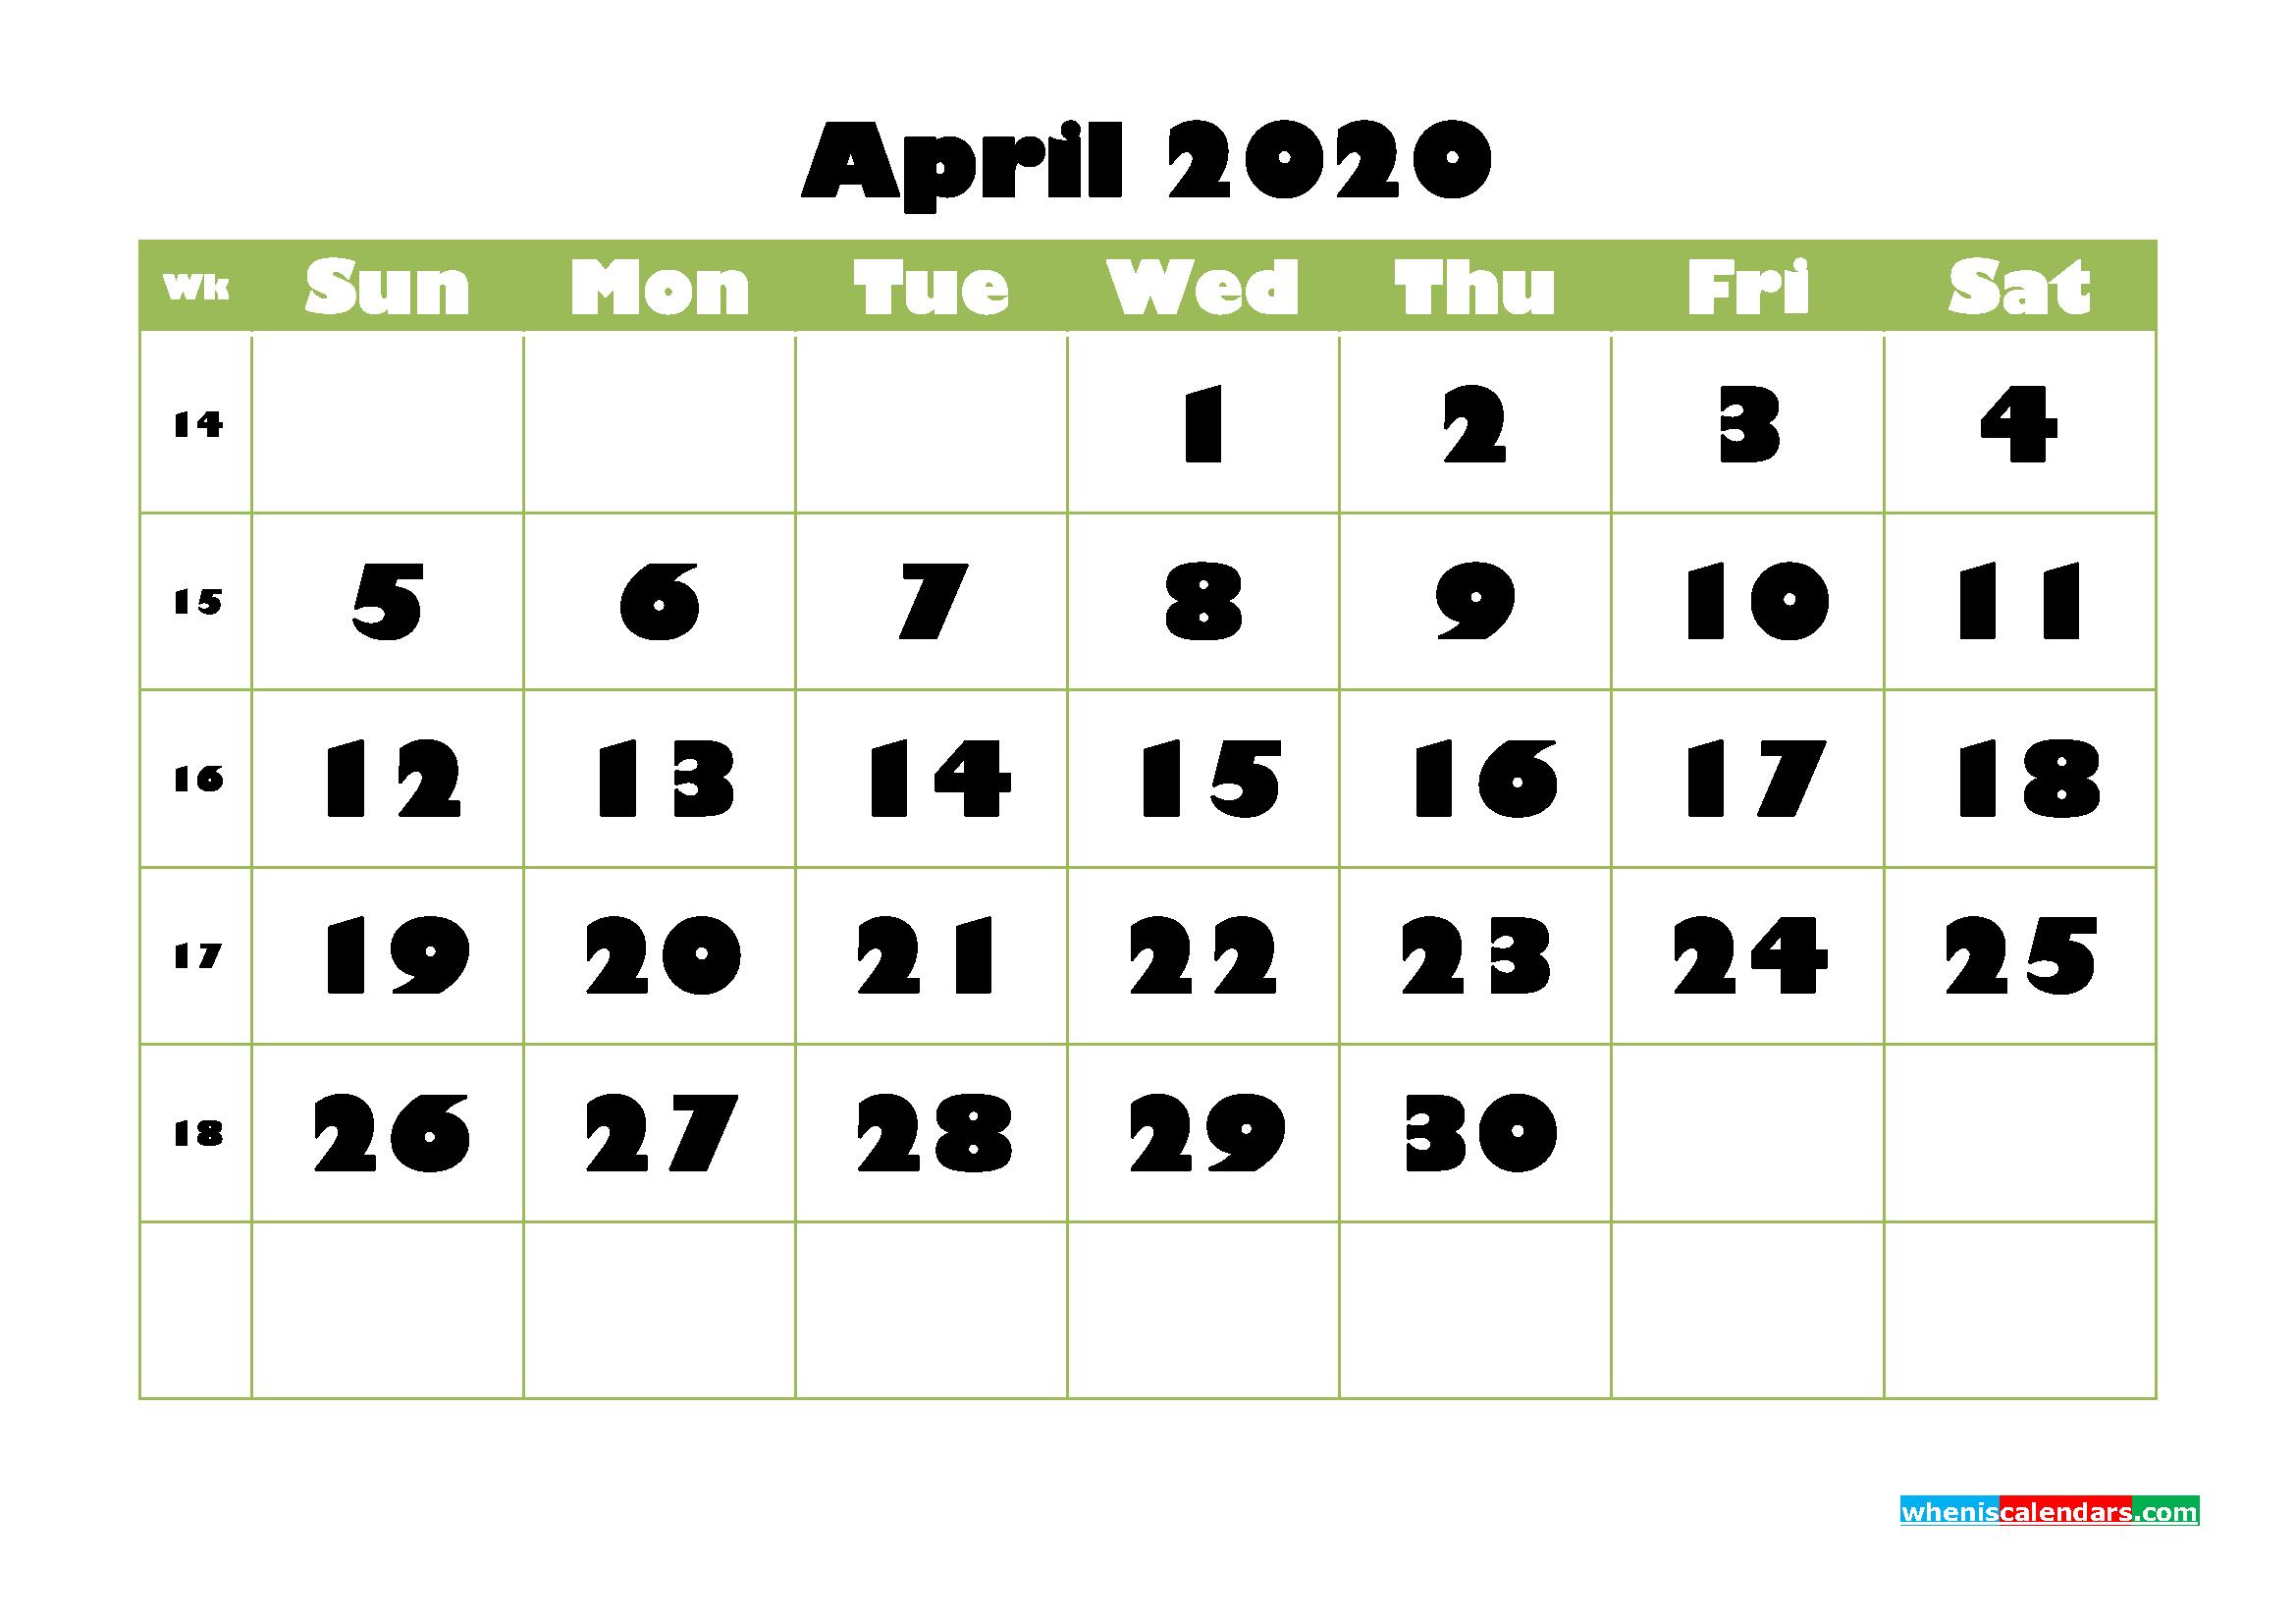 April Printable Calendar 2020 PDF, Word - No.m20b736